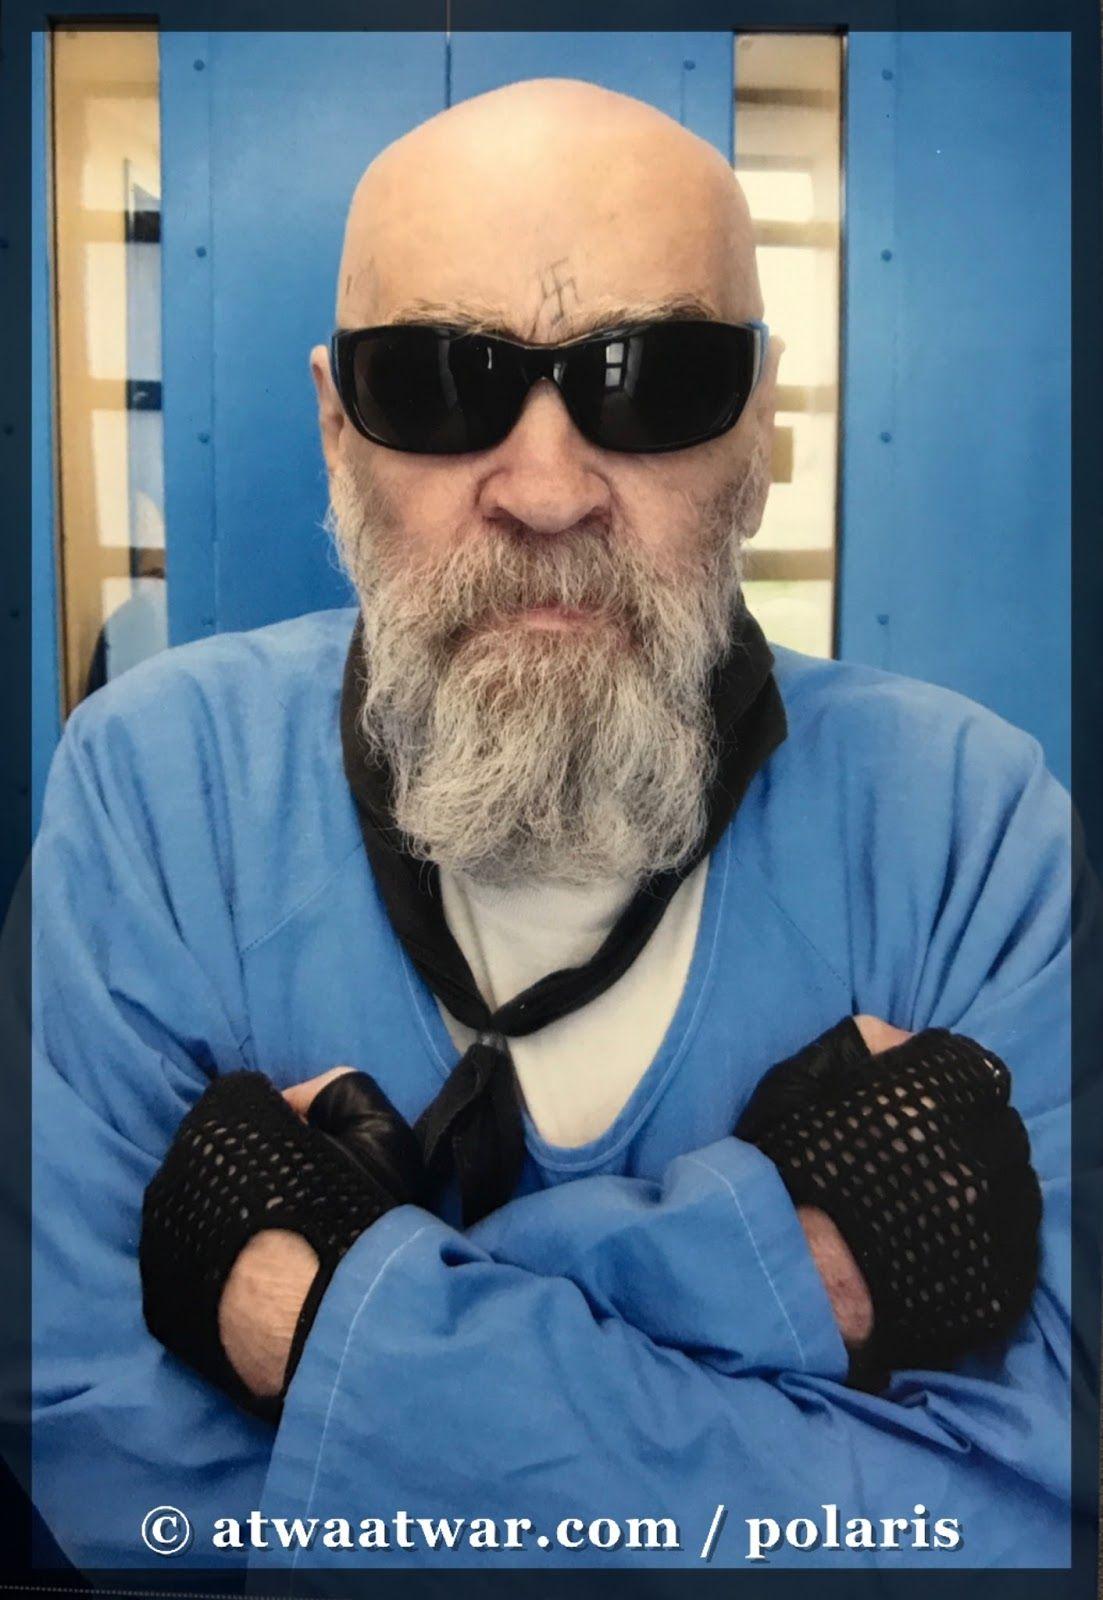 Charles Manson Dead >> Charles Manson   Helter Skelter   Pinterest   Charles manson and Helter skelter charles manson